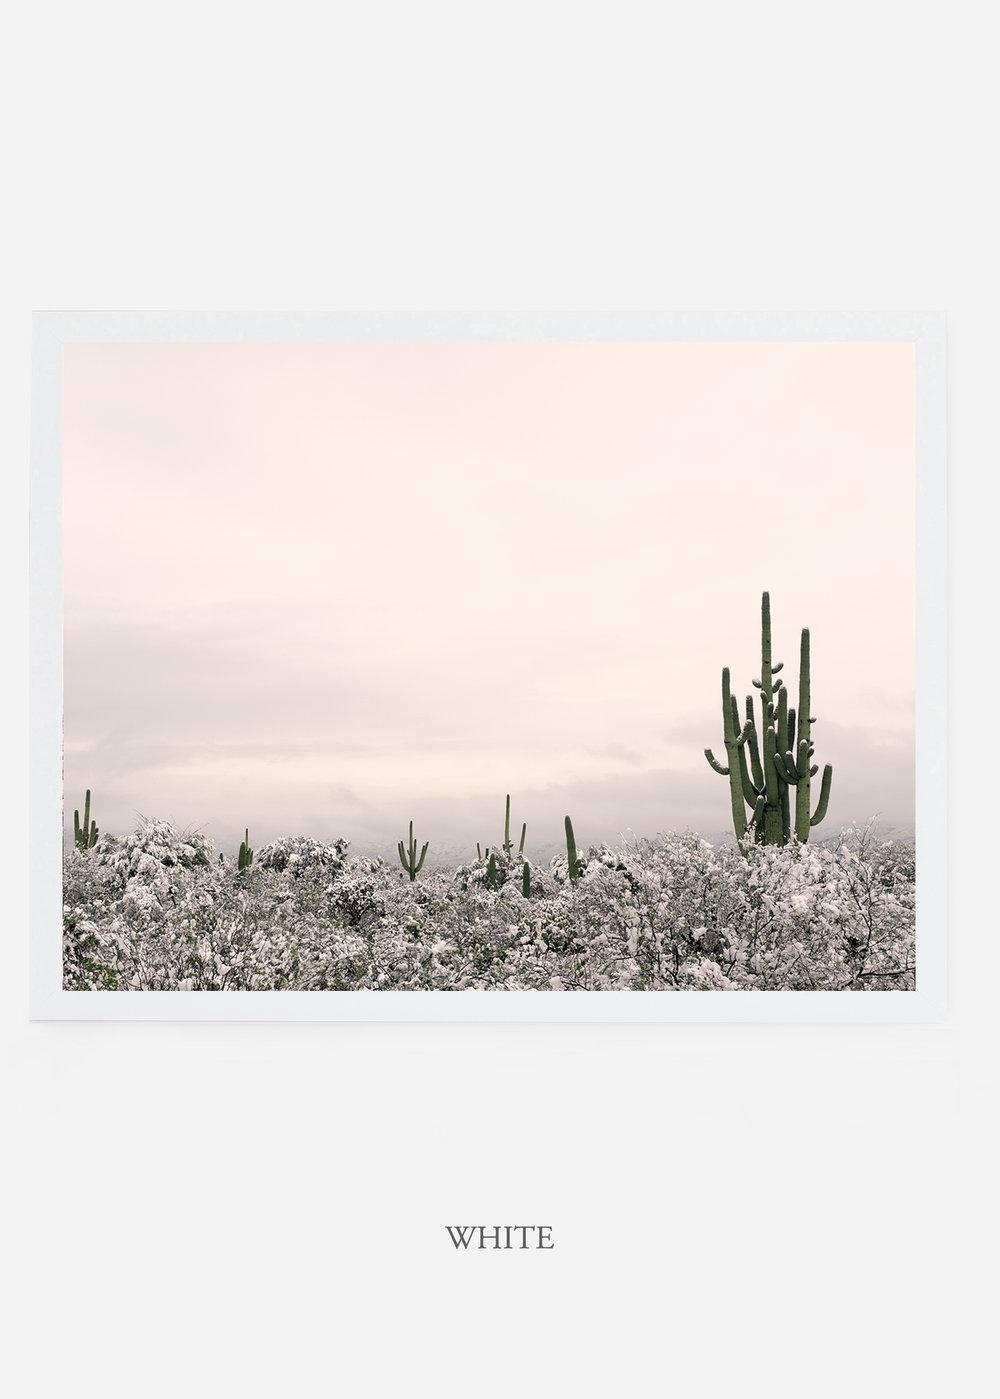 nomat_whiteframe-saguaroNo.7-wildercalifornia-art-wallart-cactusprint-homedecor-prints-arizona-botanical-artwork-interiordesign.jpg